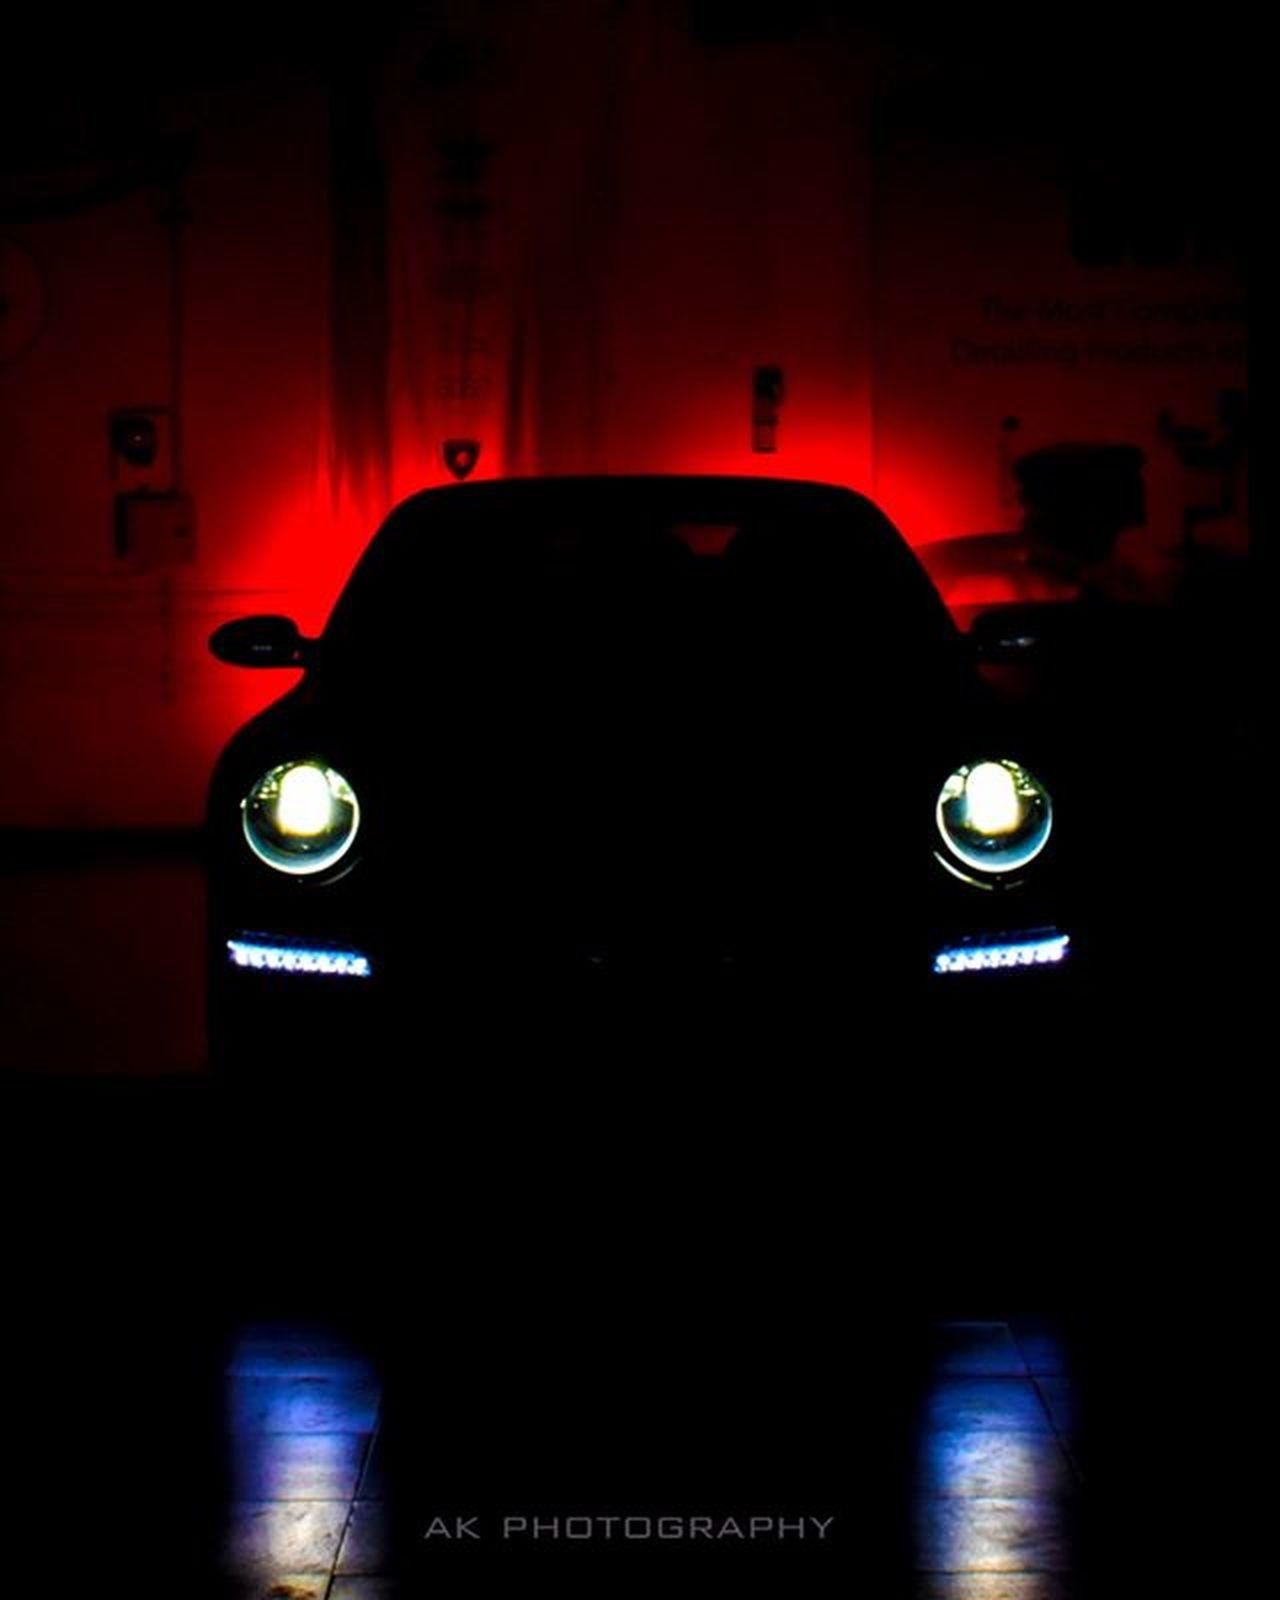 Porsche Uberwerkstatt More pics coming soon.. •• Porschemotorsport Porscheindia Autogespotindia Porscheclassics Automobiliardent Porschelife Carlifestyle Carsinstagram Thegermancarguy Petrolheadz Carsindia Automotivation Petrolheadz APA .photo Porschesphotopage